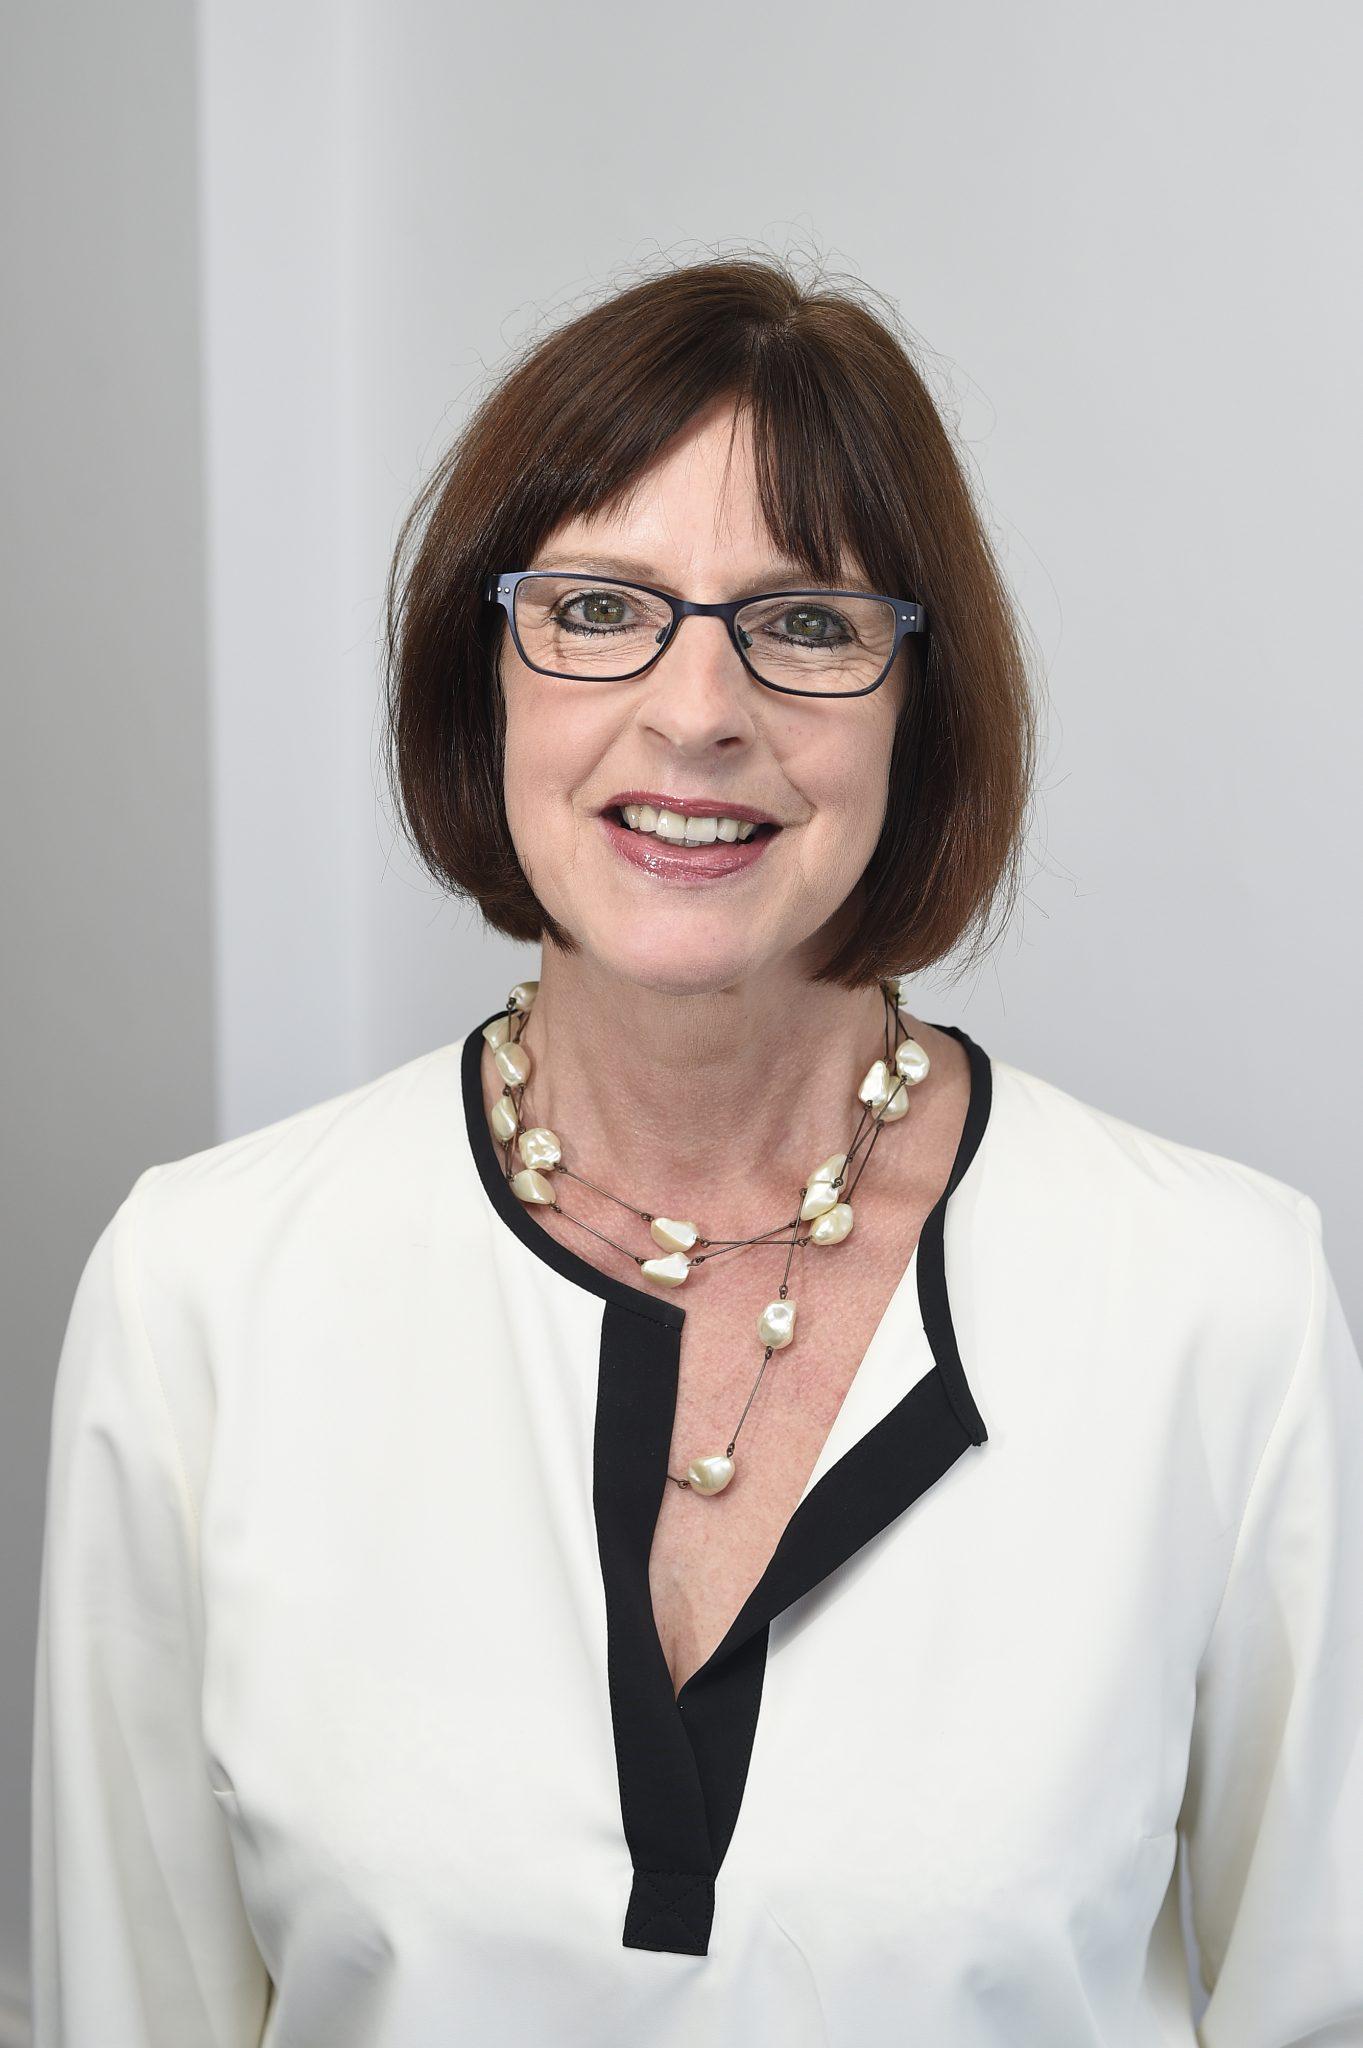 Debbie Zima